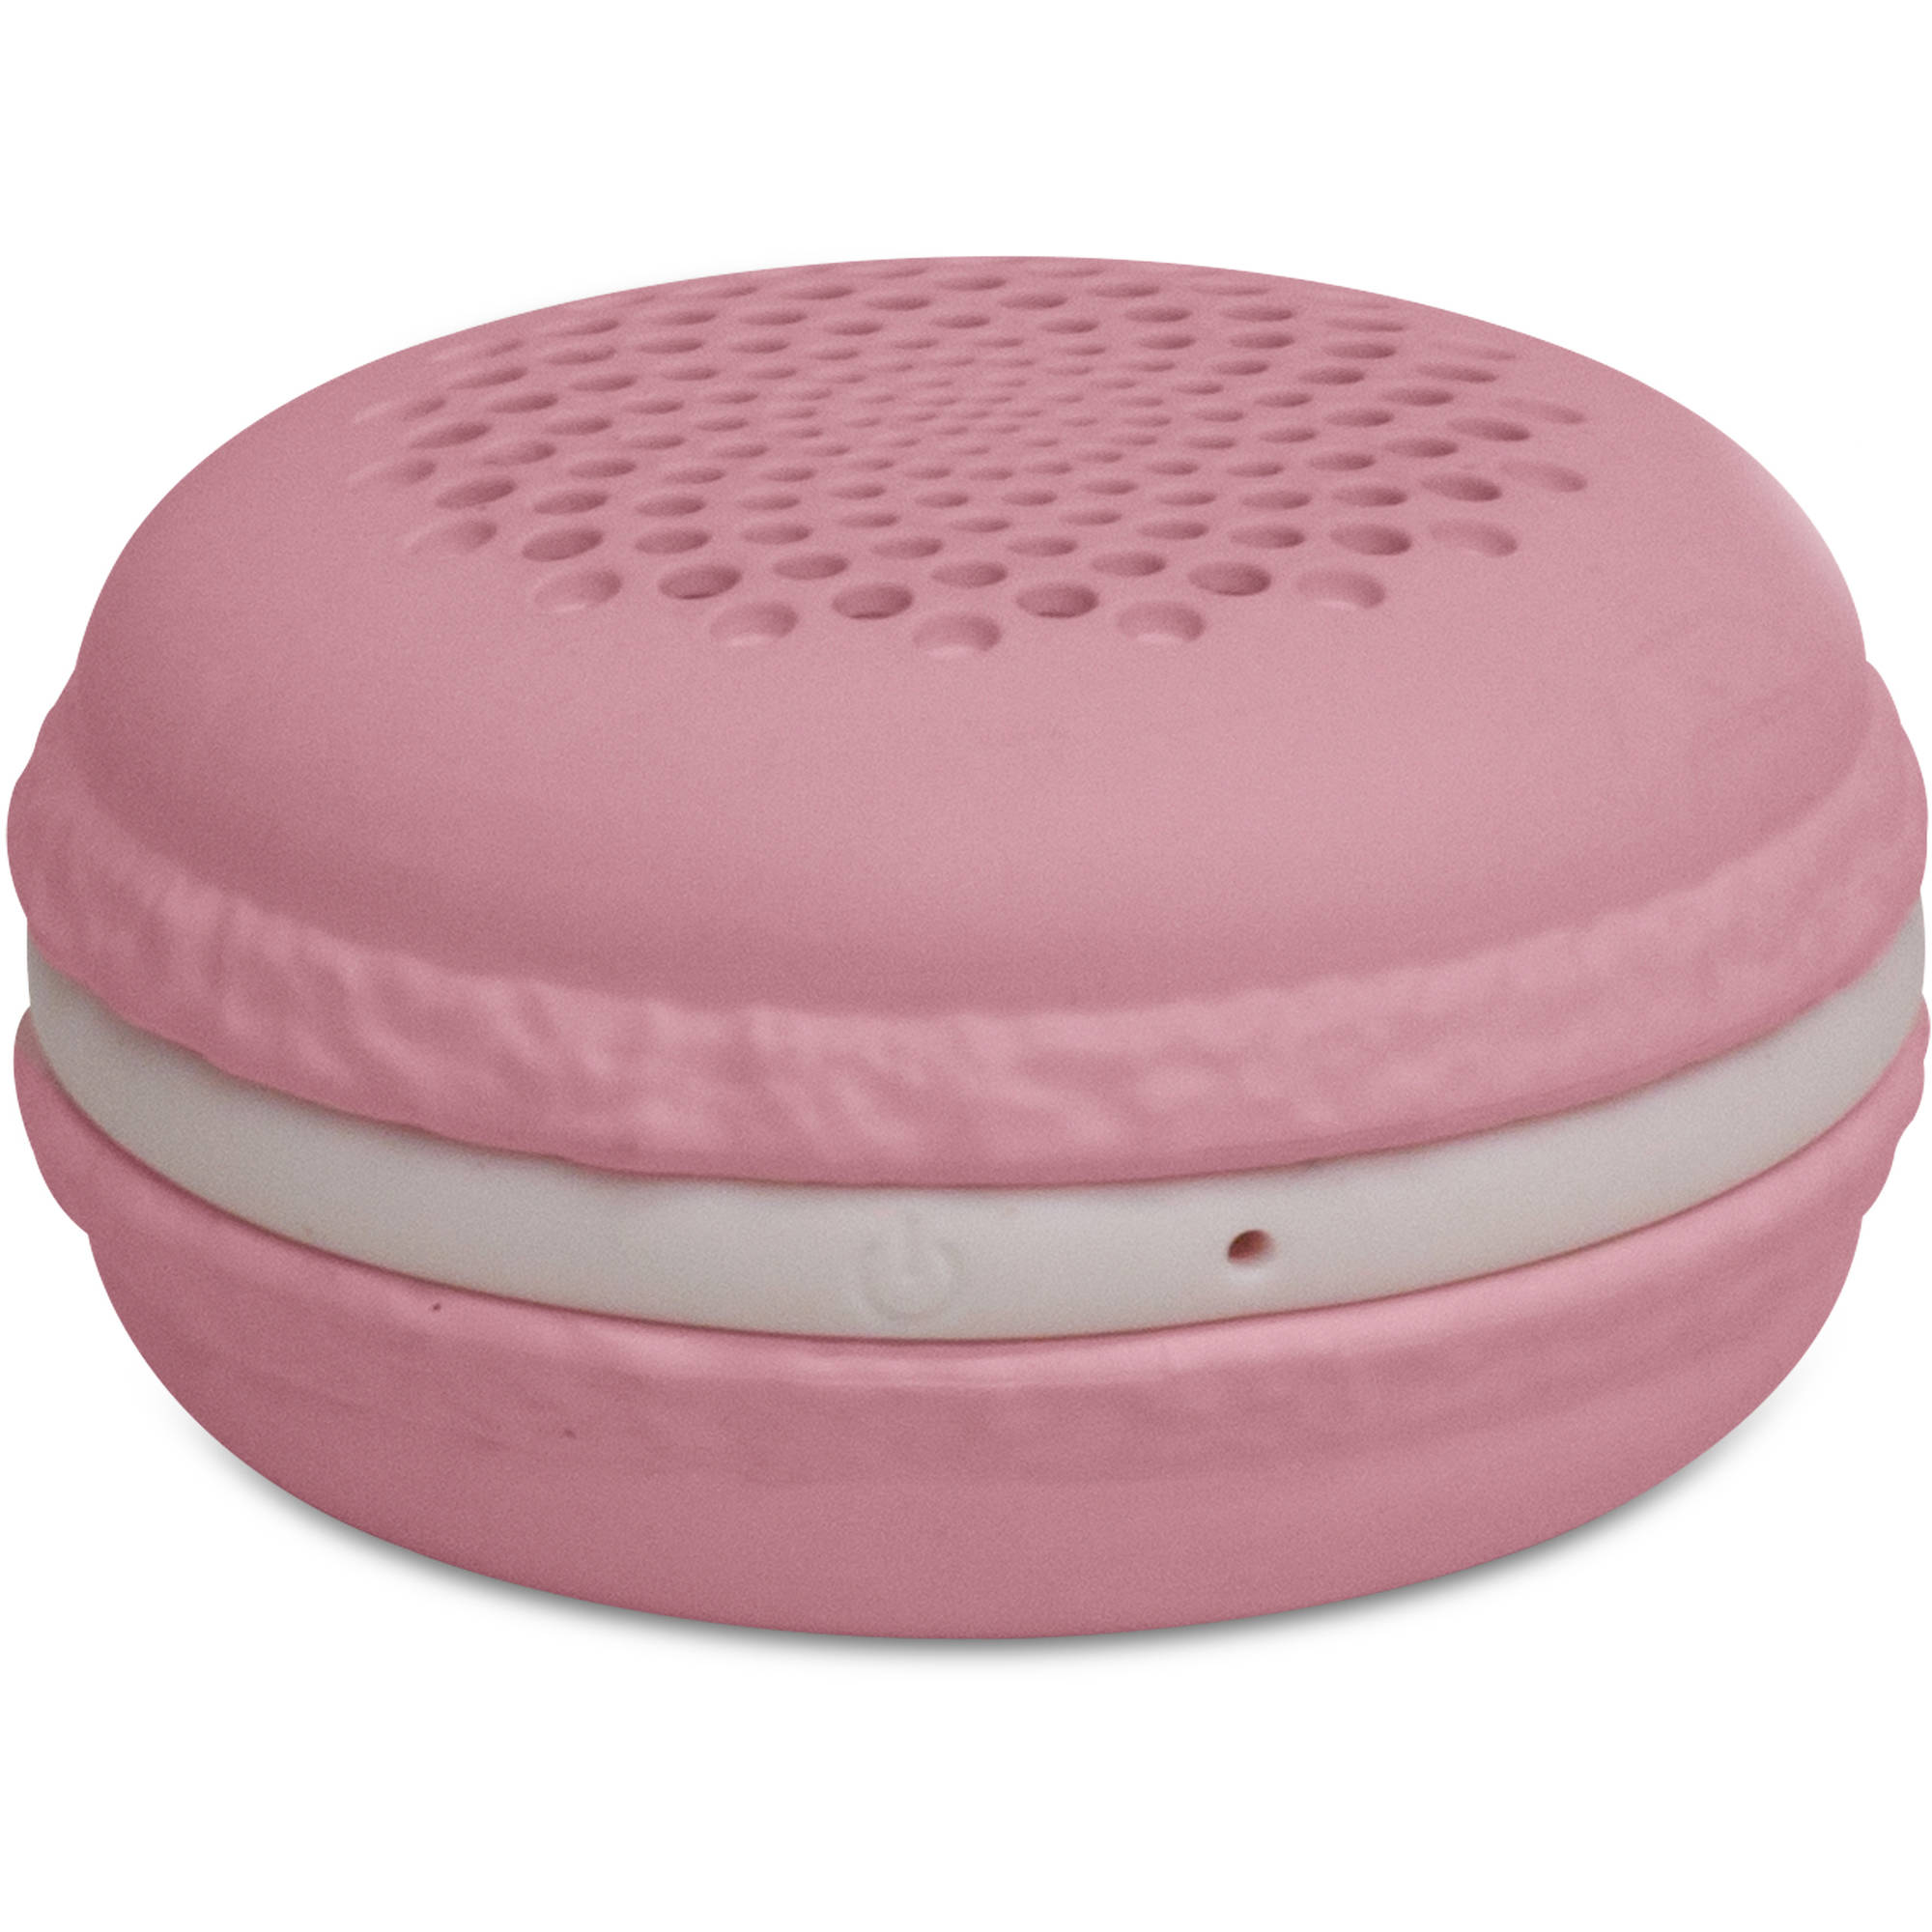 Sceptre McCaron Bluetooth Speaker, Pink